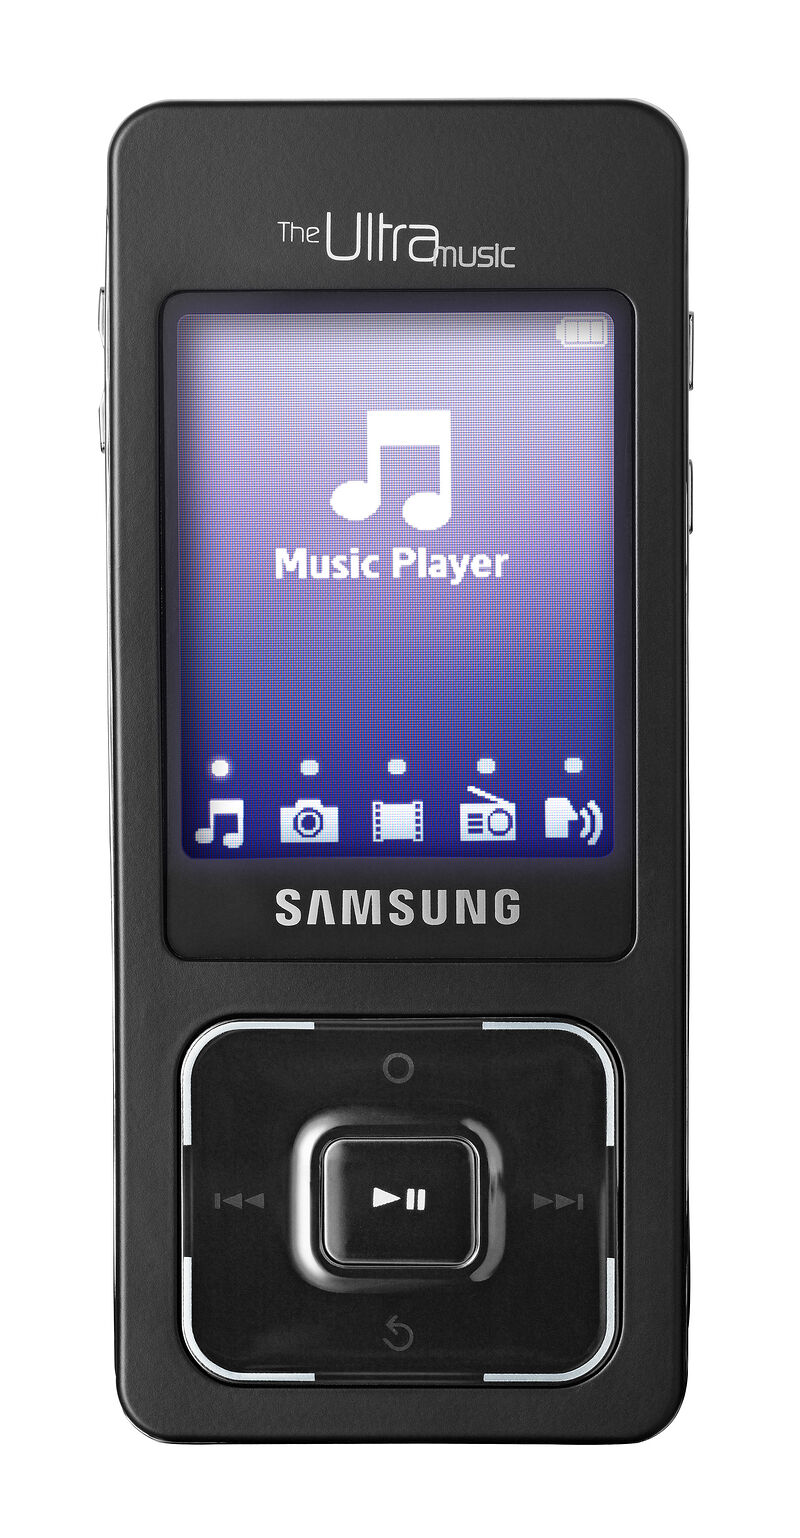 Samsung SGH-F300 (Ultra Music)